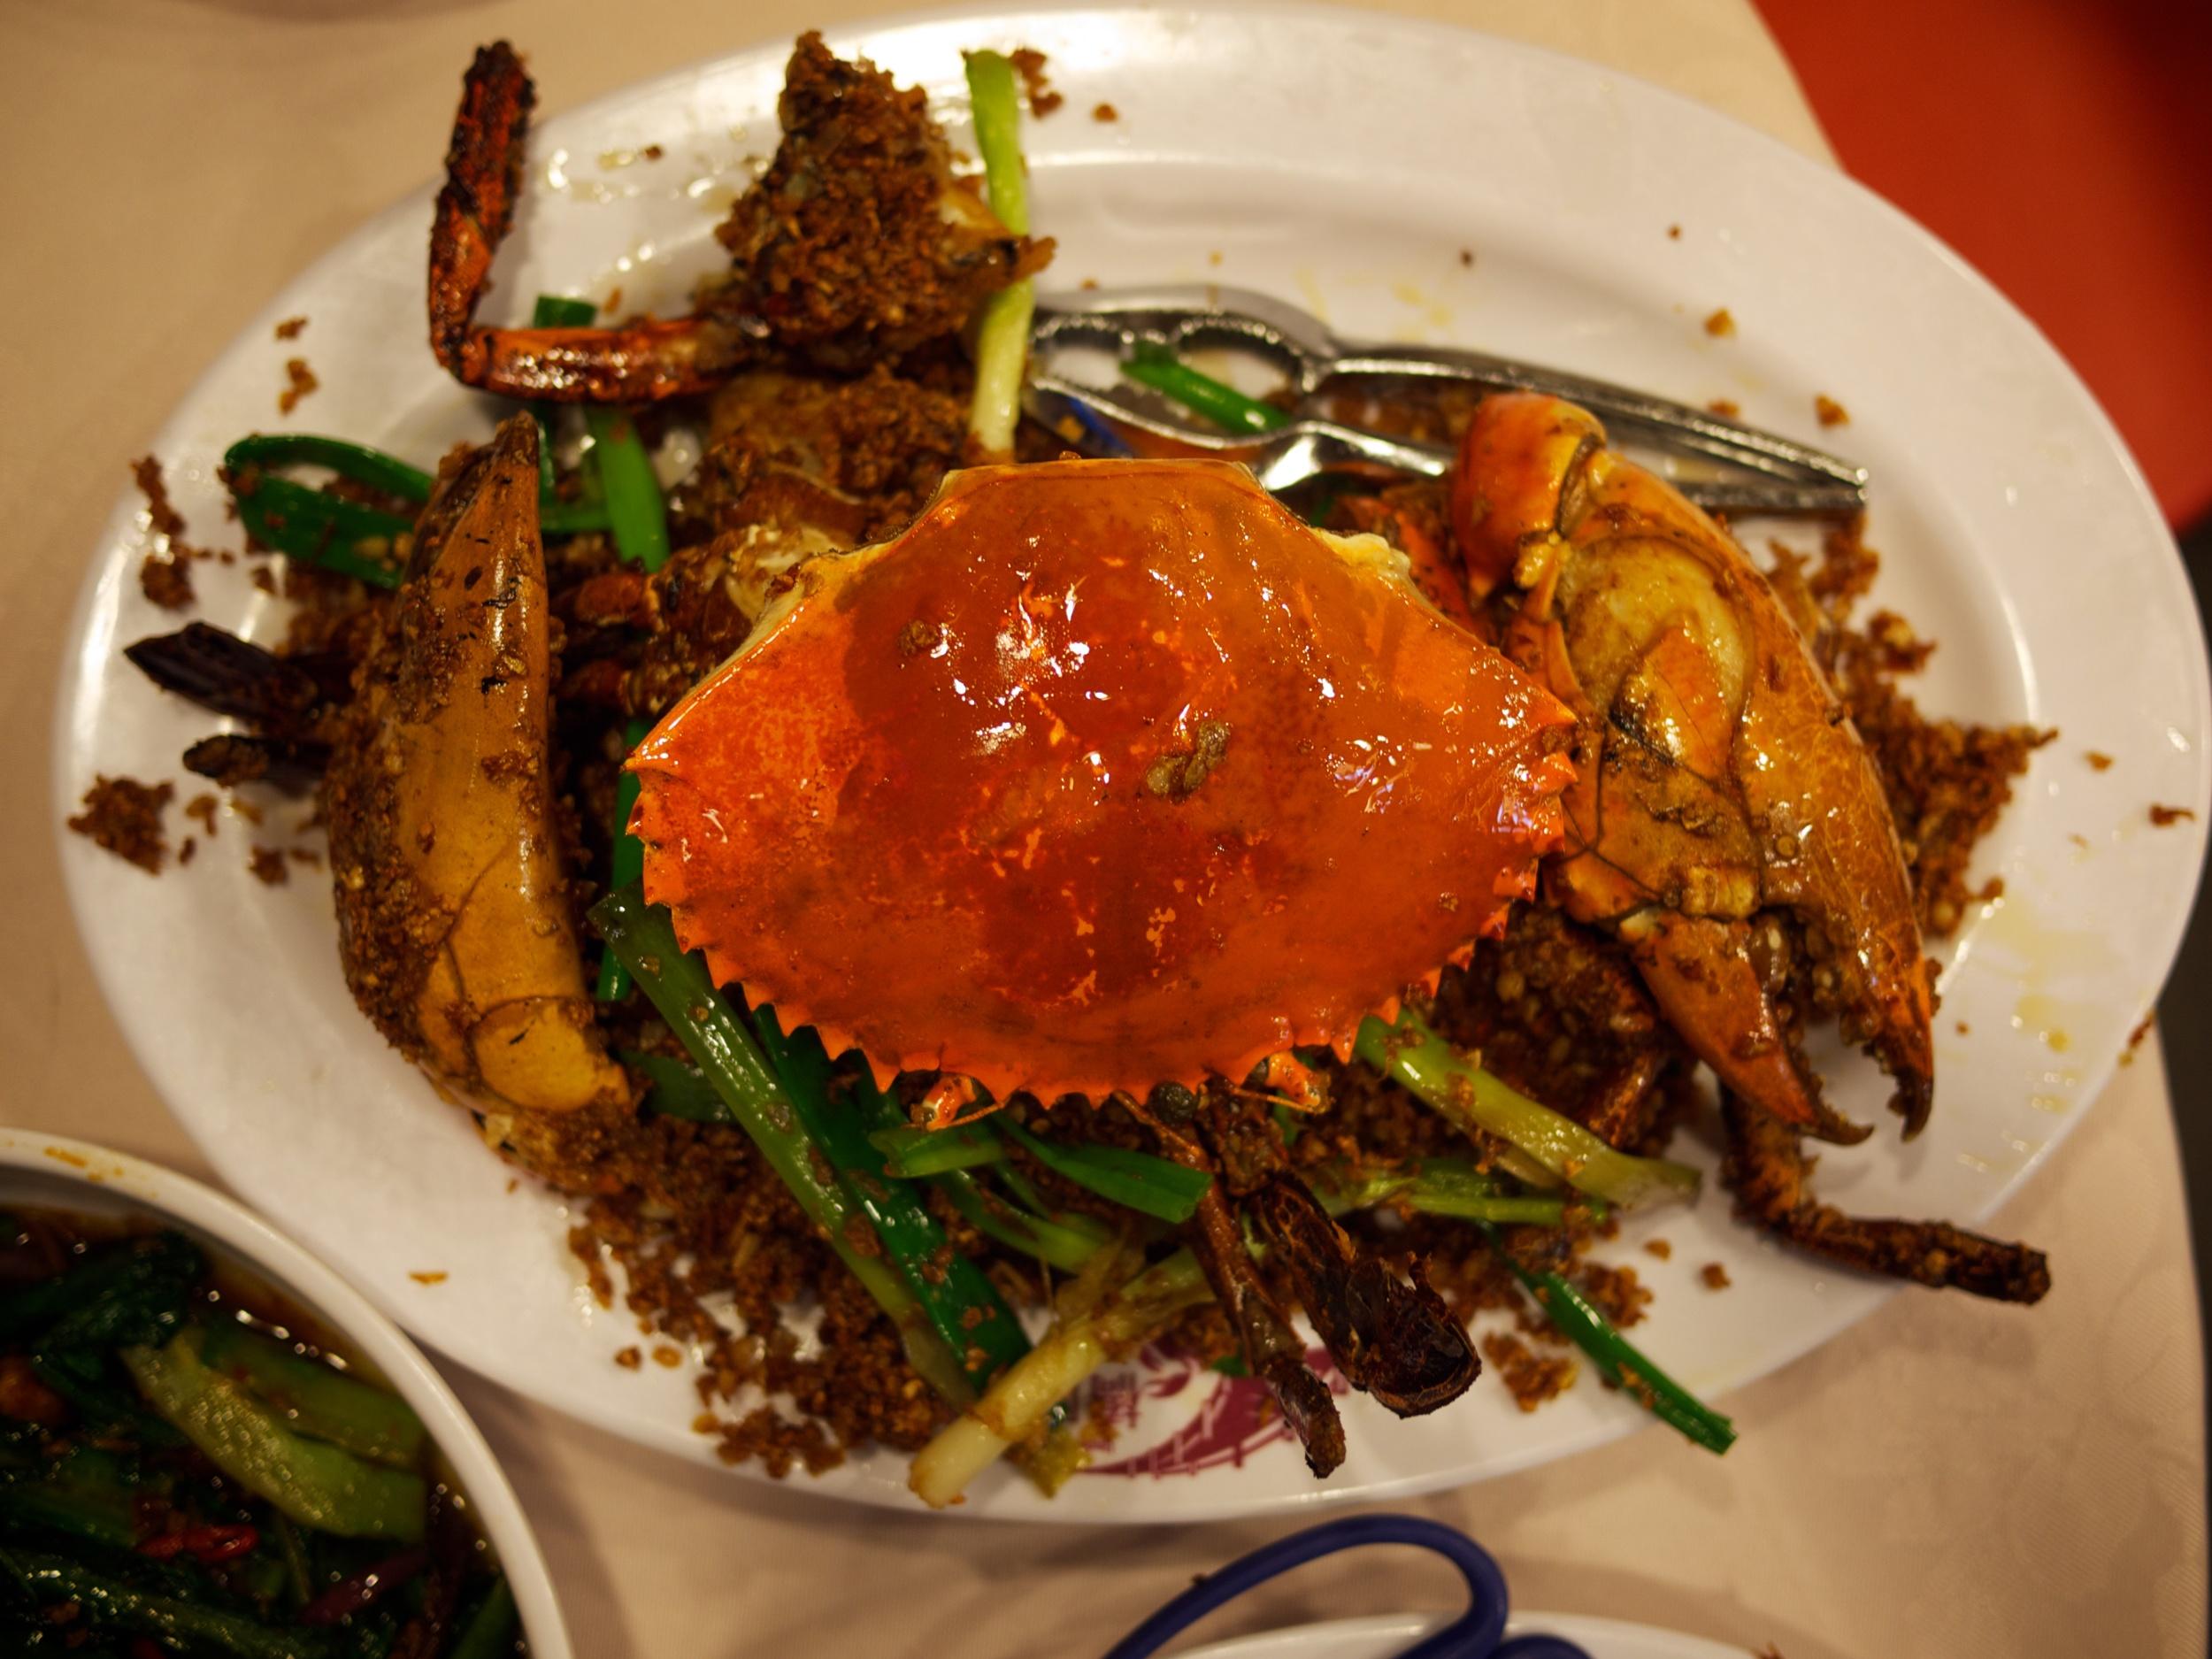 FOOD-ChiliCrab_2011-09-04_18-50-48_P1040274_©JosephLinaschke2011.jpg